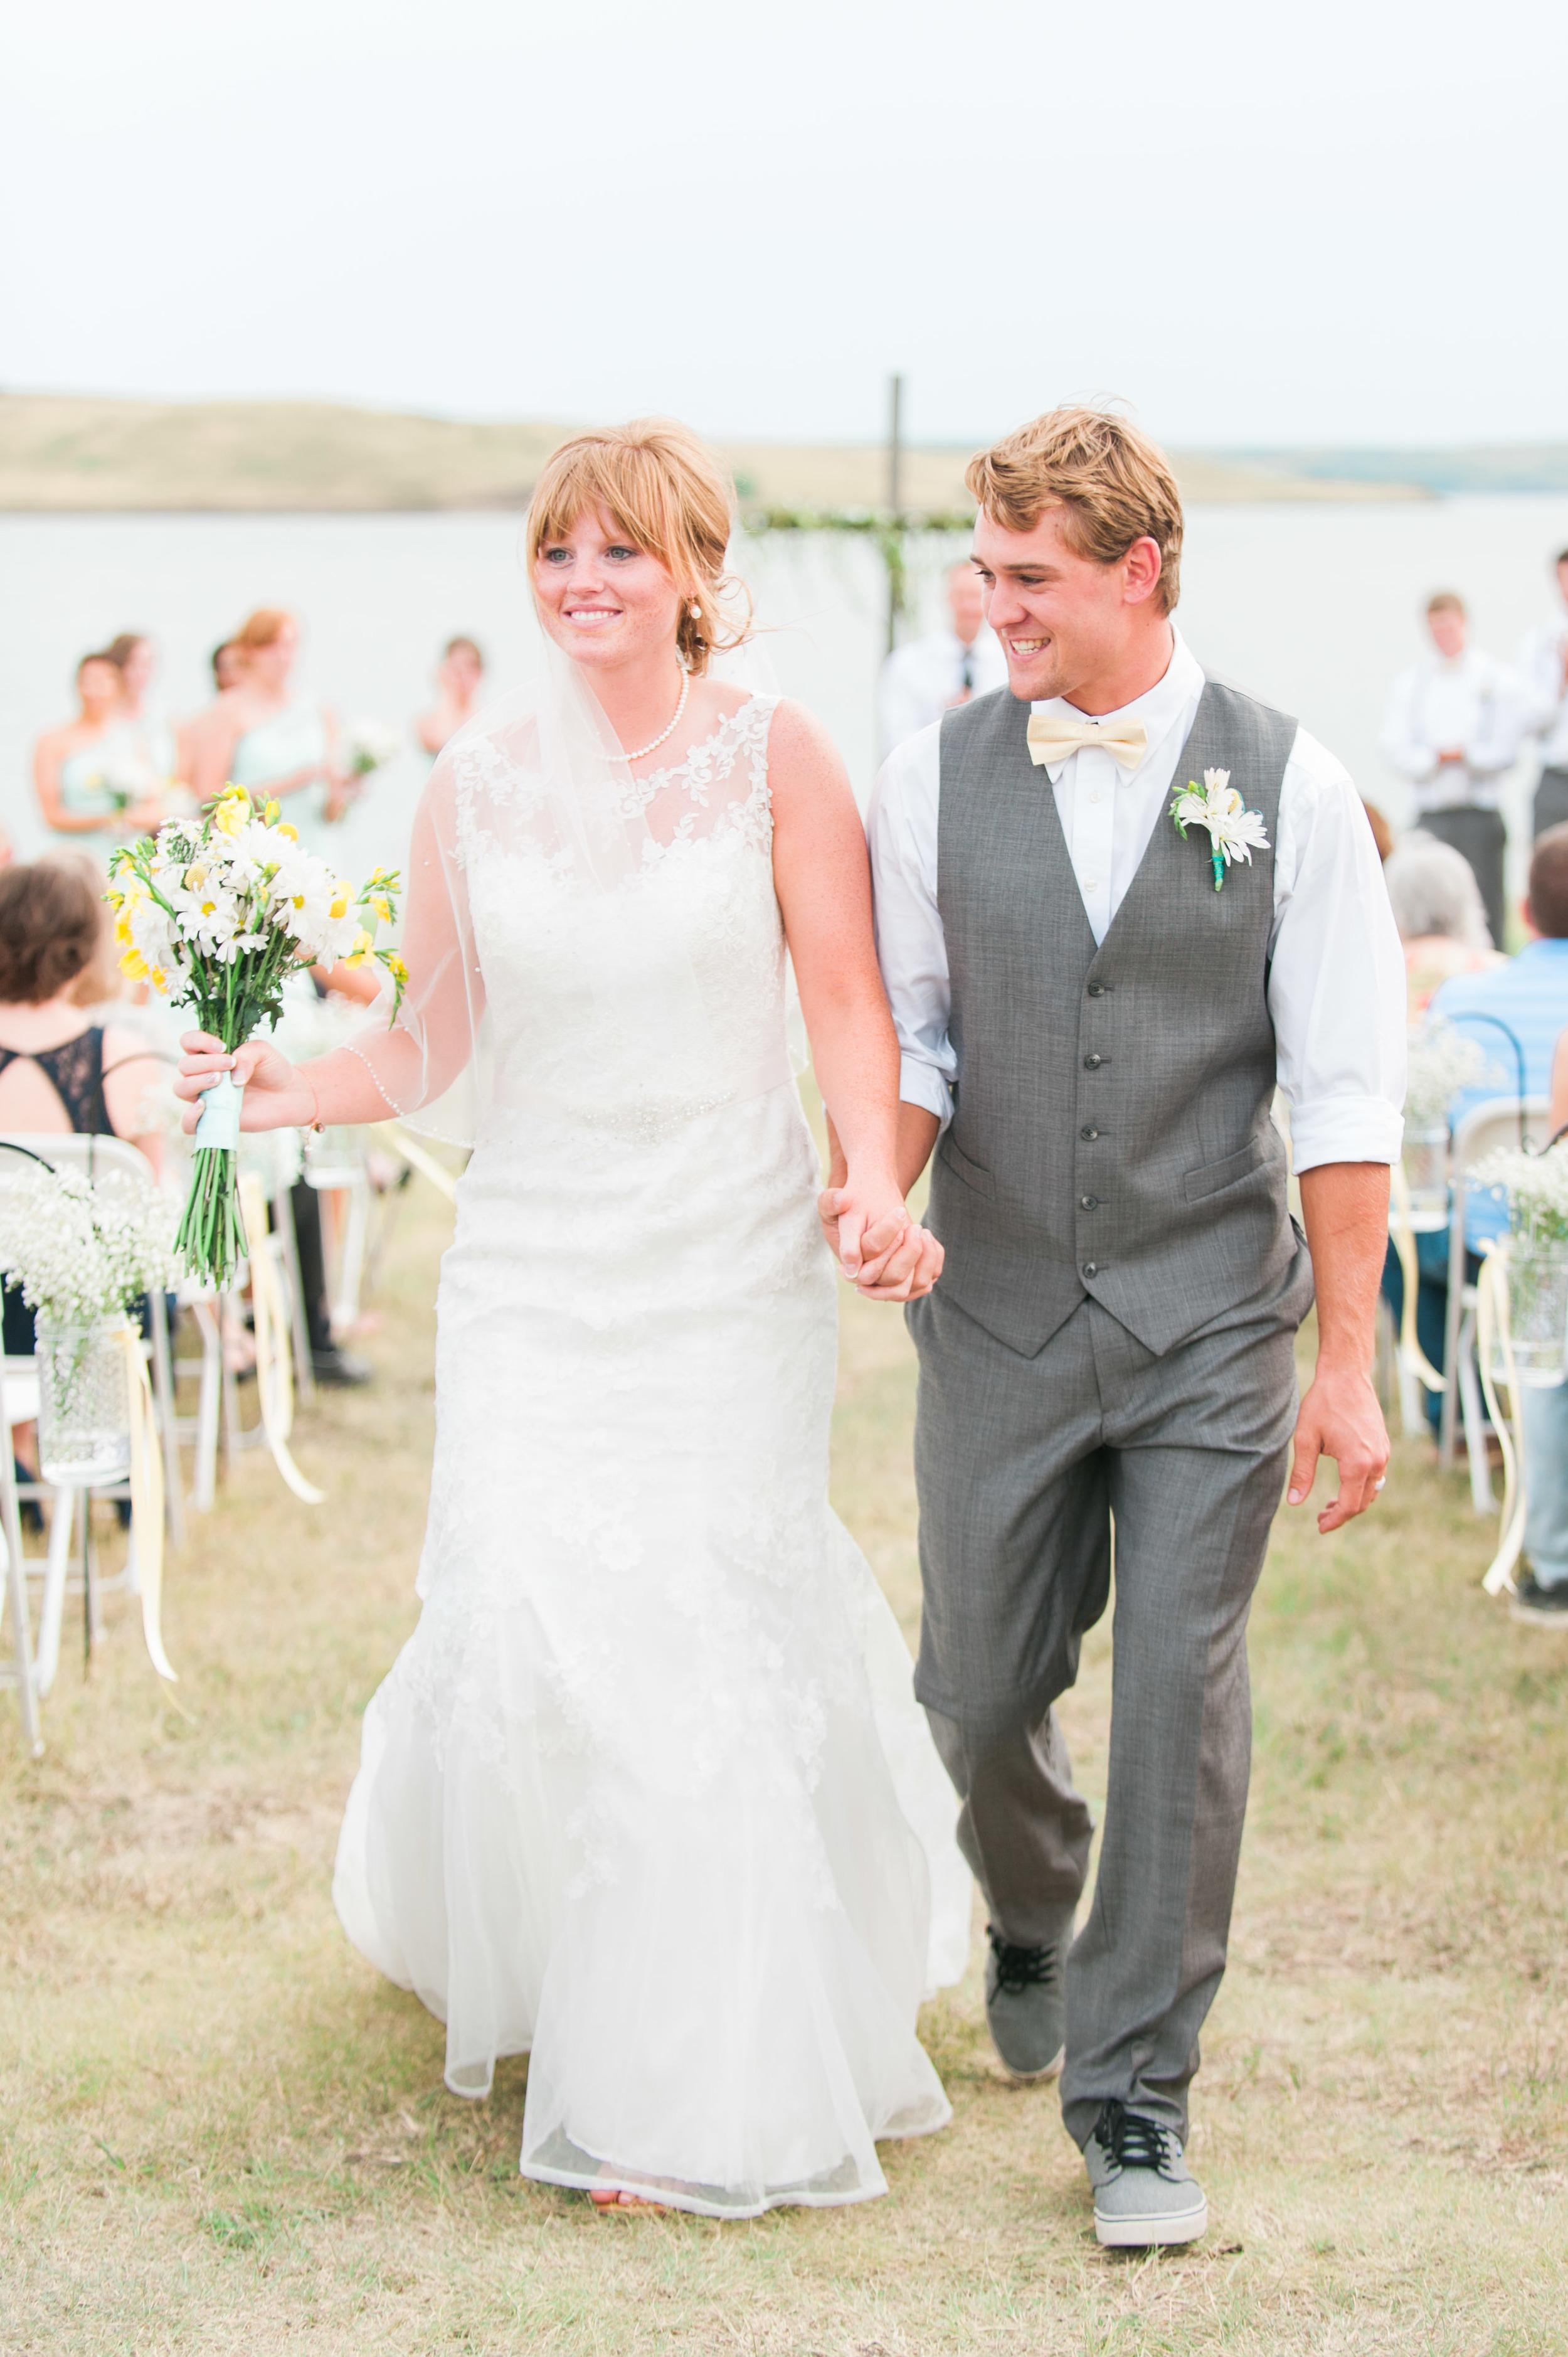 wedding-photography-27.jpg